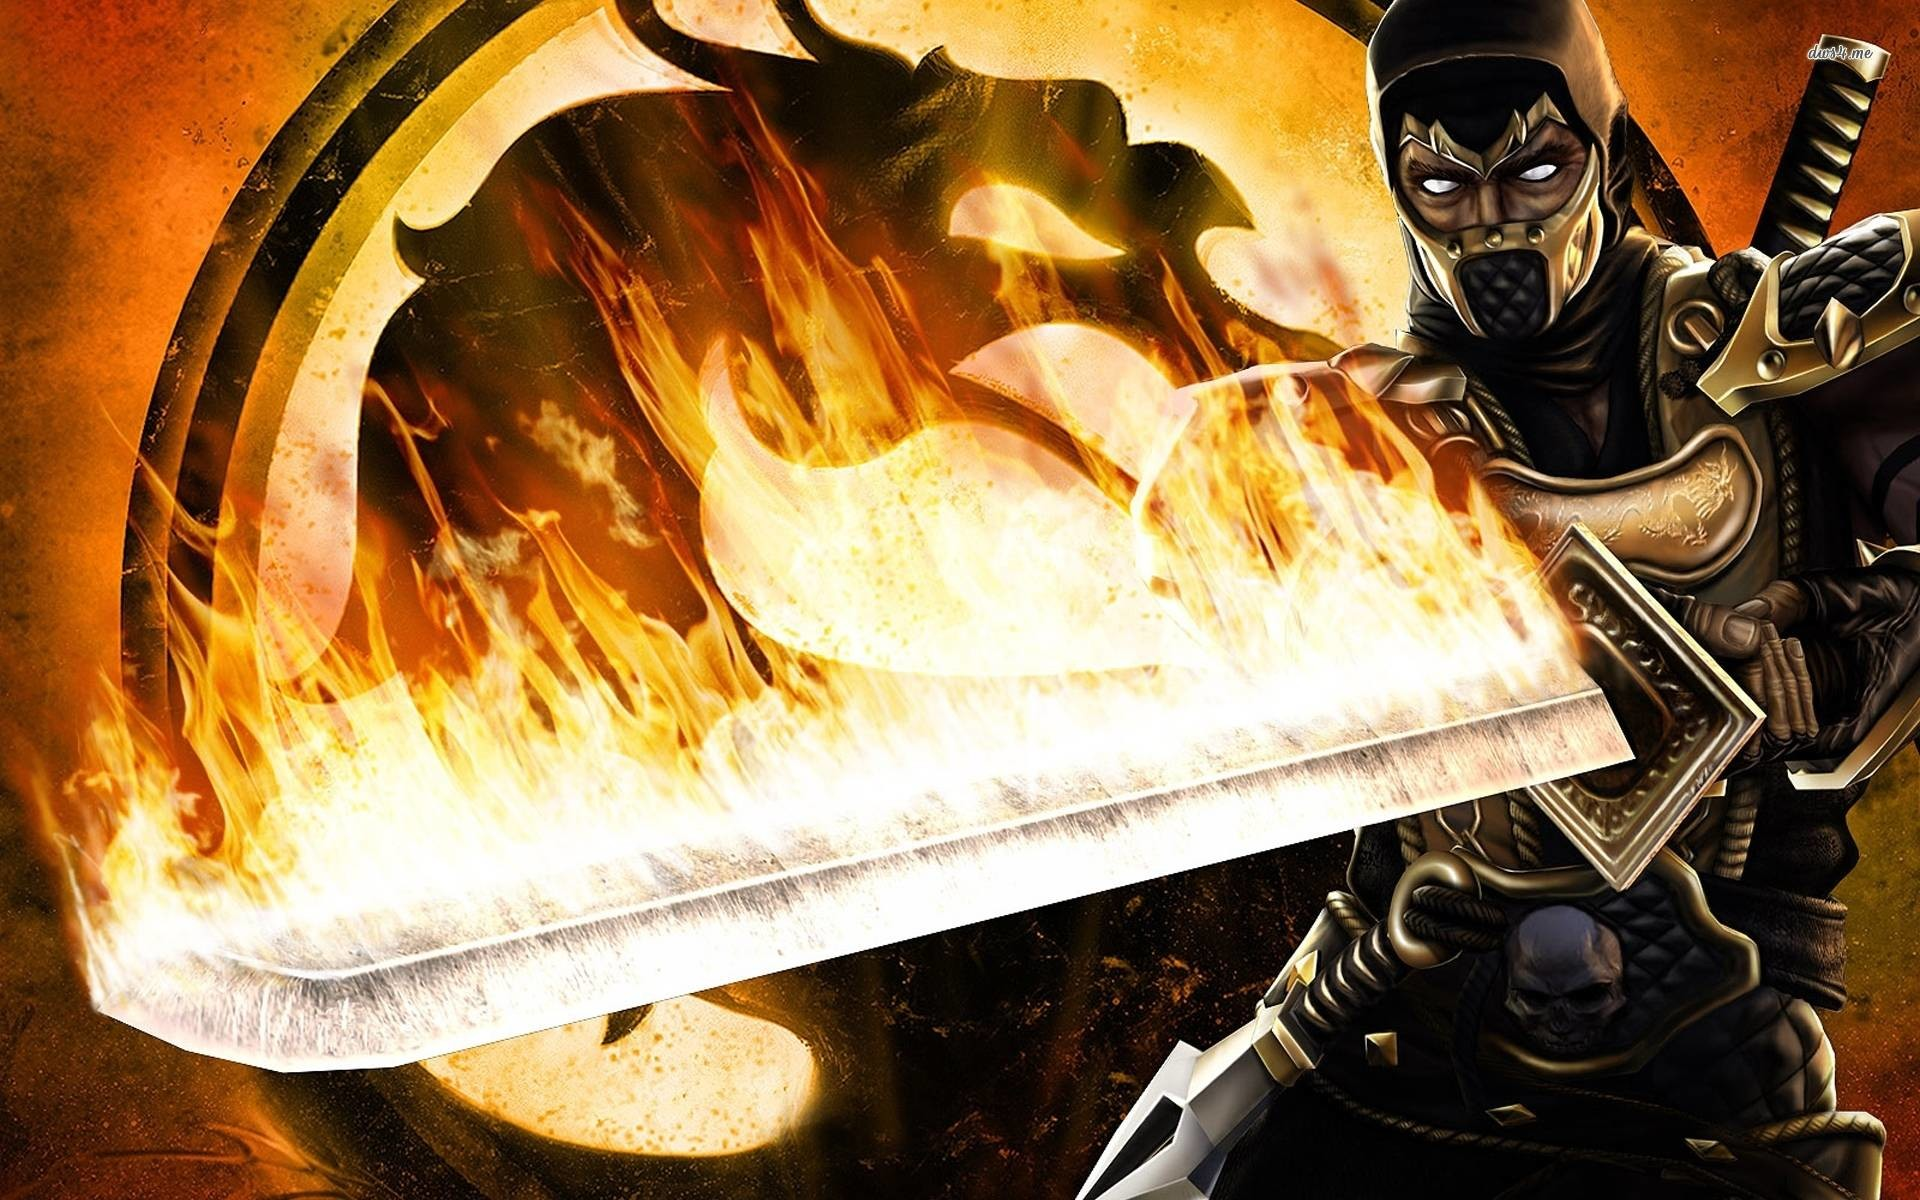 Mortal Kombat Scorpion Wallpapers – Full HD wallpaper search